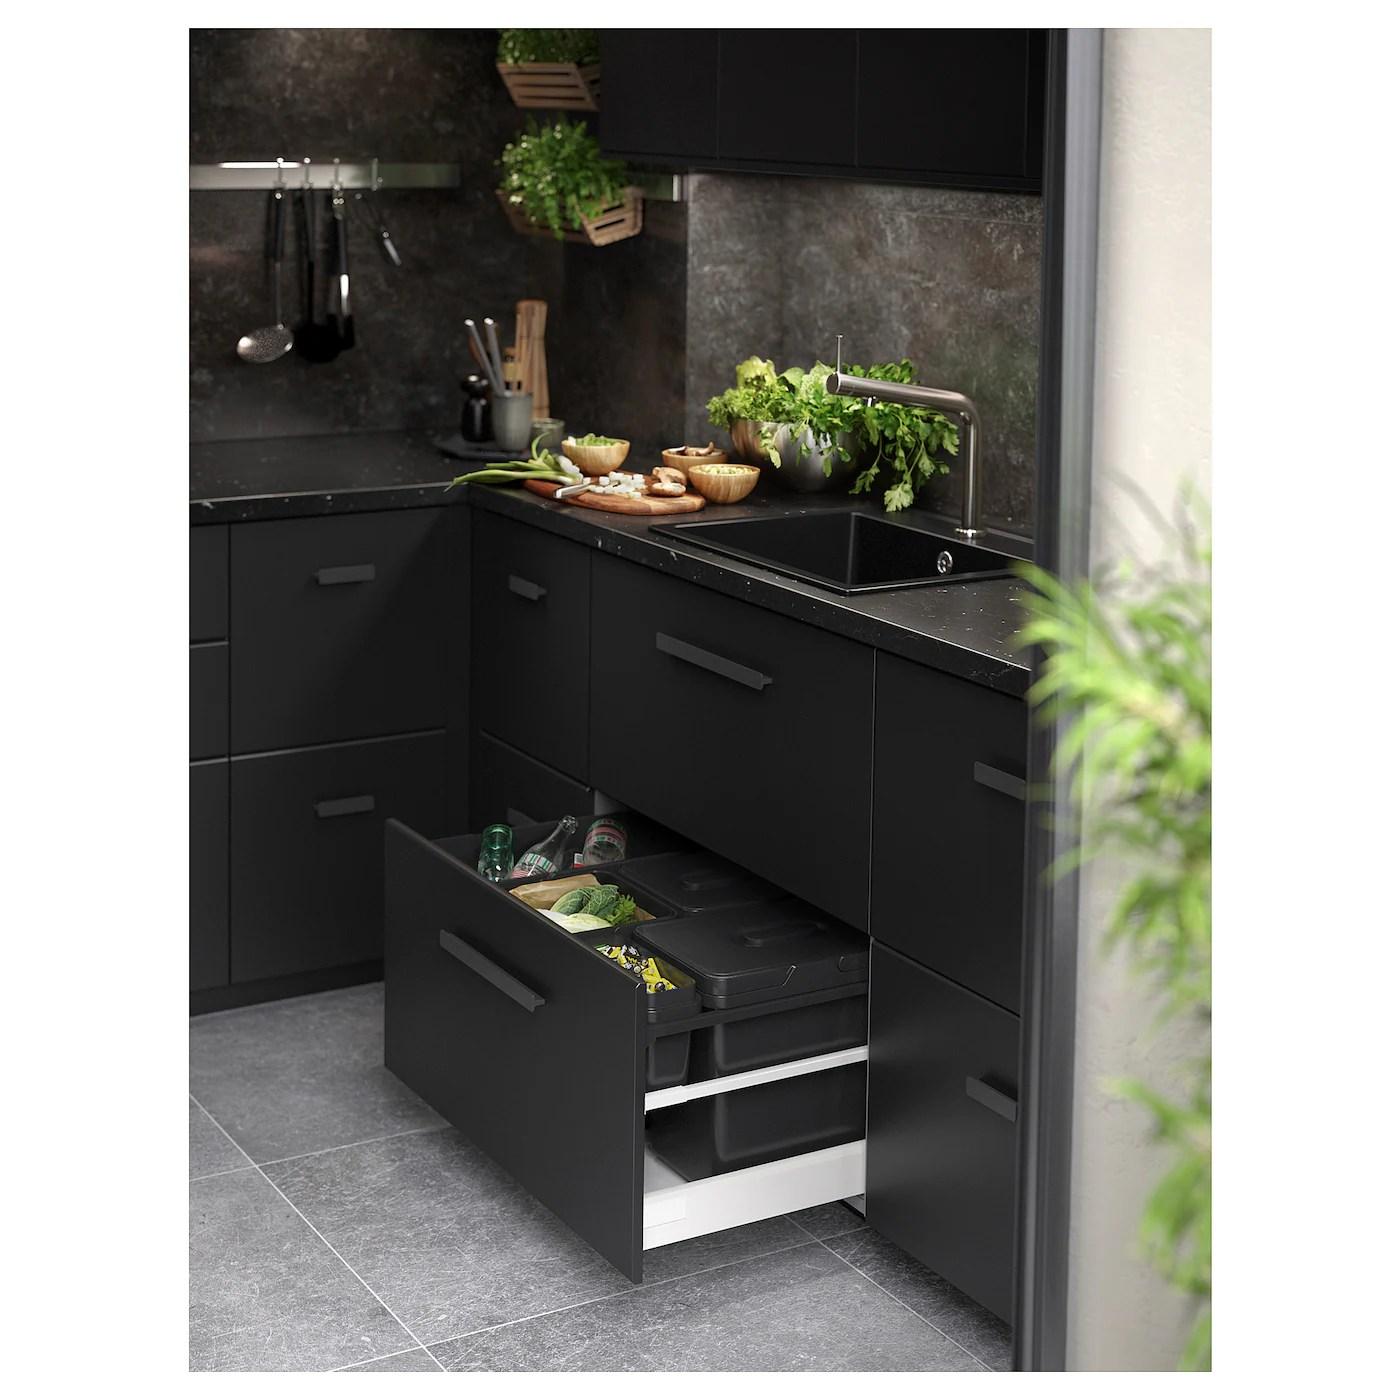 Saljan Plan De Travail Sur Mesure Noir Marbre Stratifie 45 Ikea